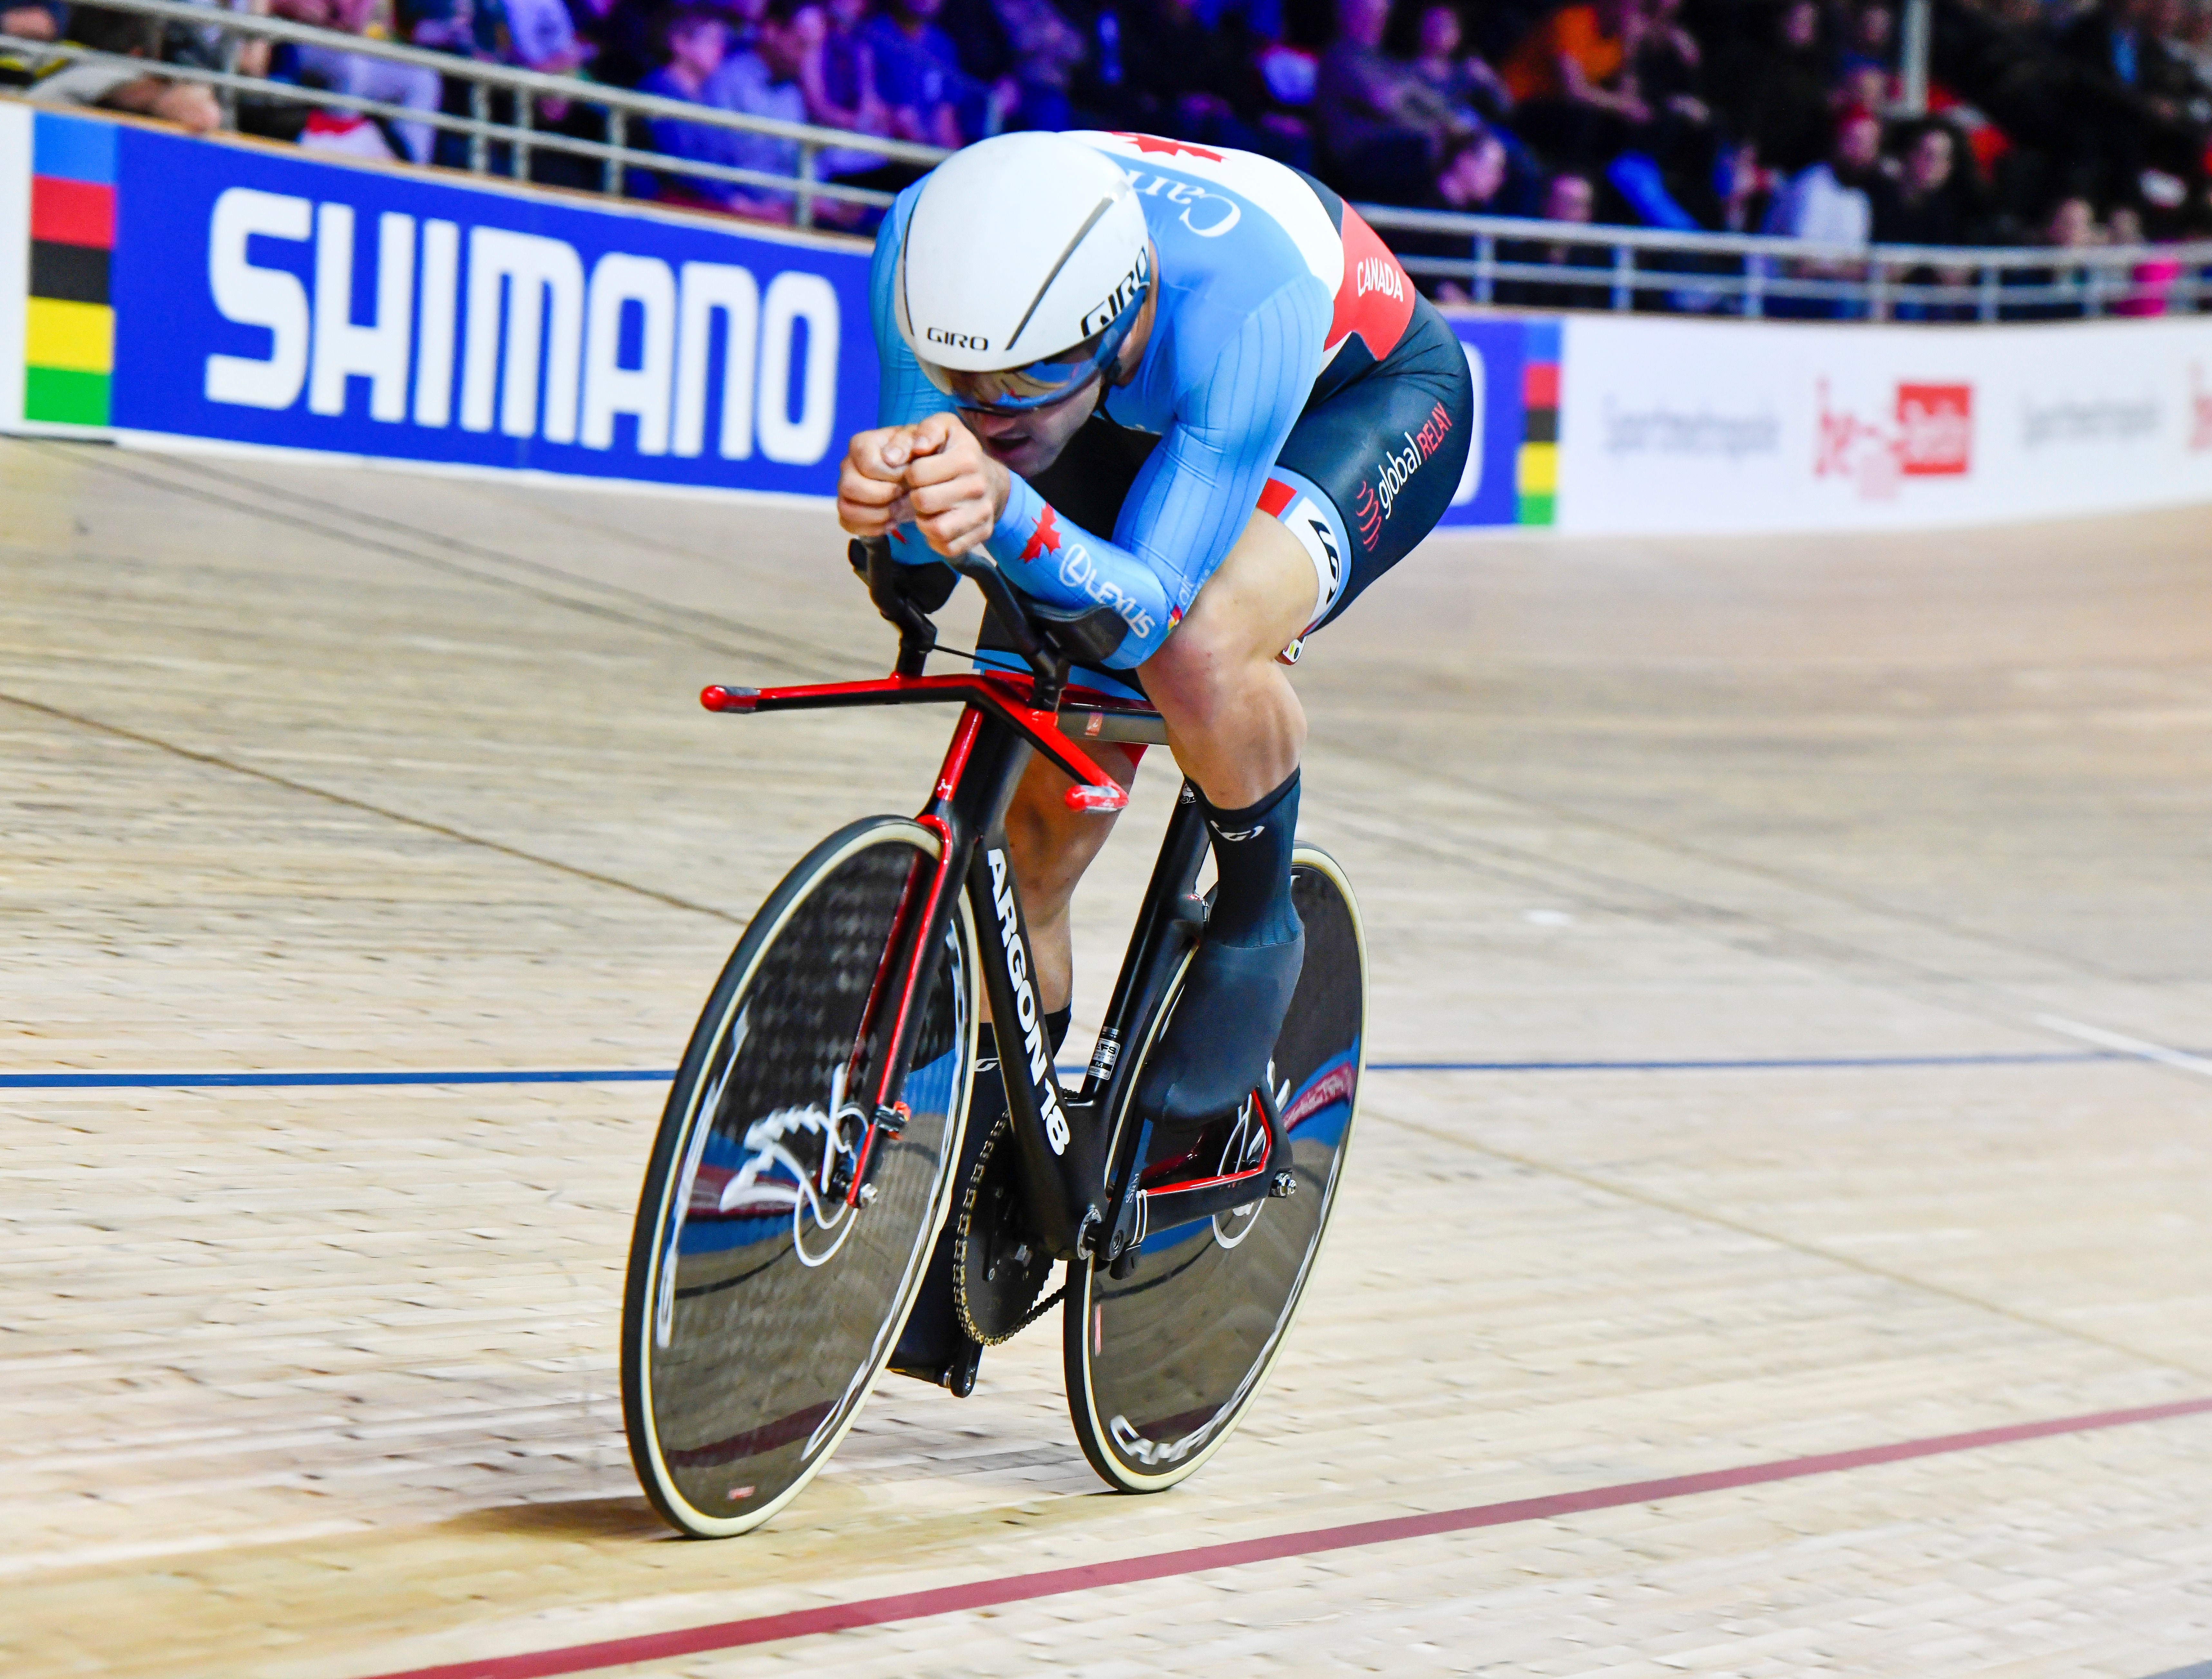 Vincent de Haitre racing on bike in velodrome